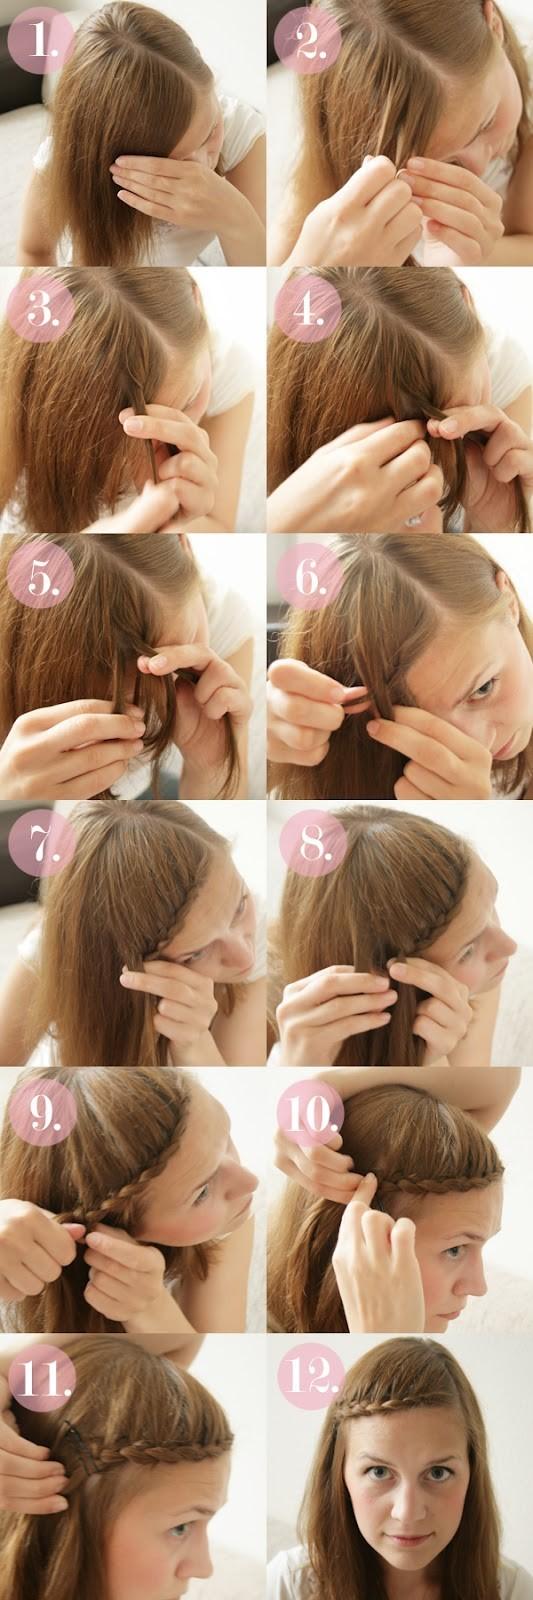 Superb 15 Braided Bangs Tutorials Cute Easy Hairstyles Pretty Designs Short Hairstyles Gunalazisus